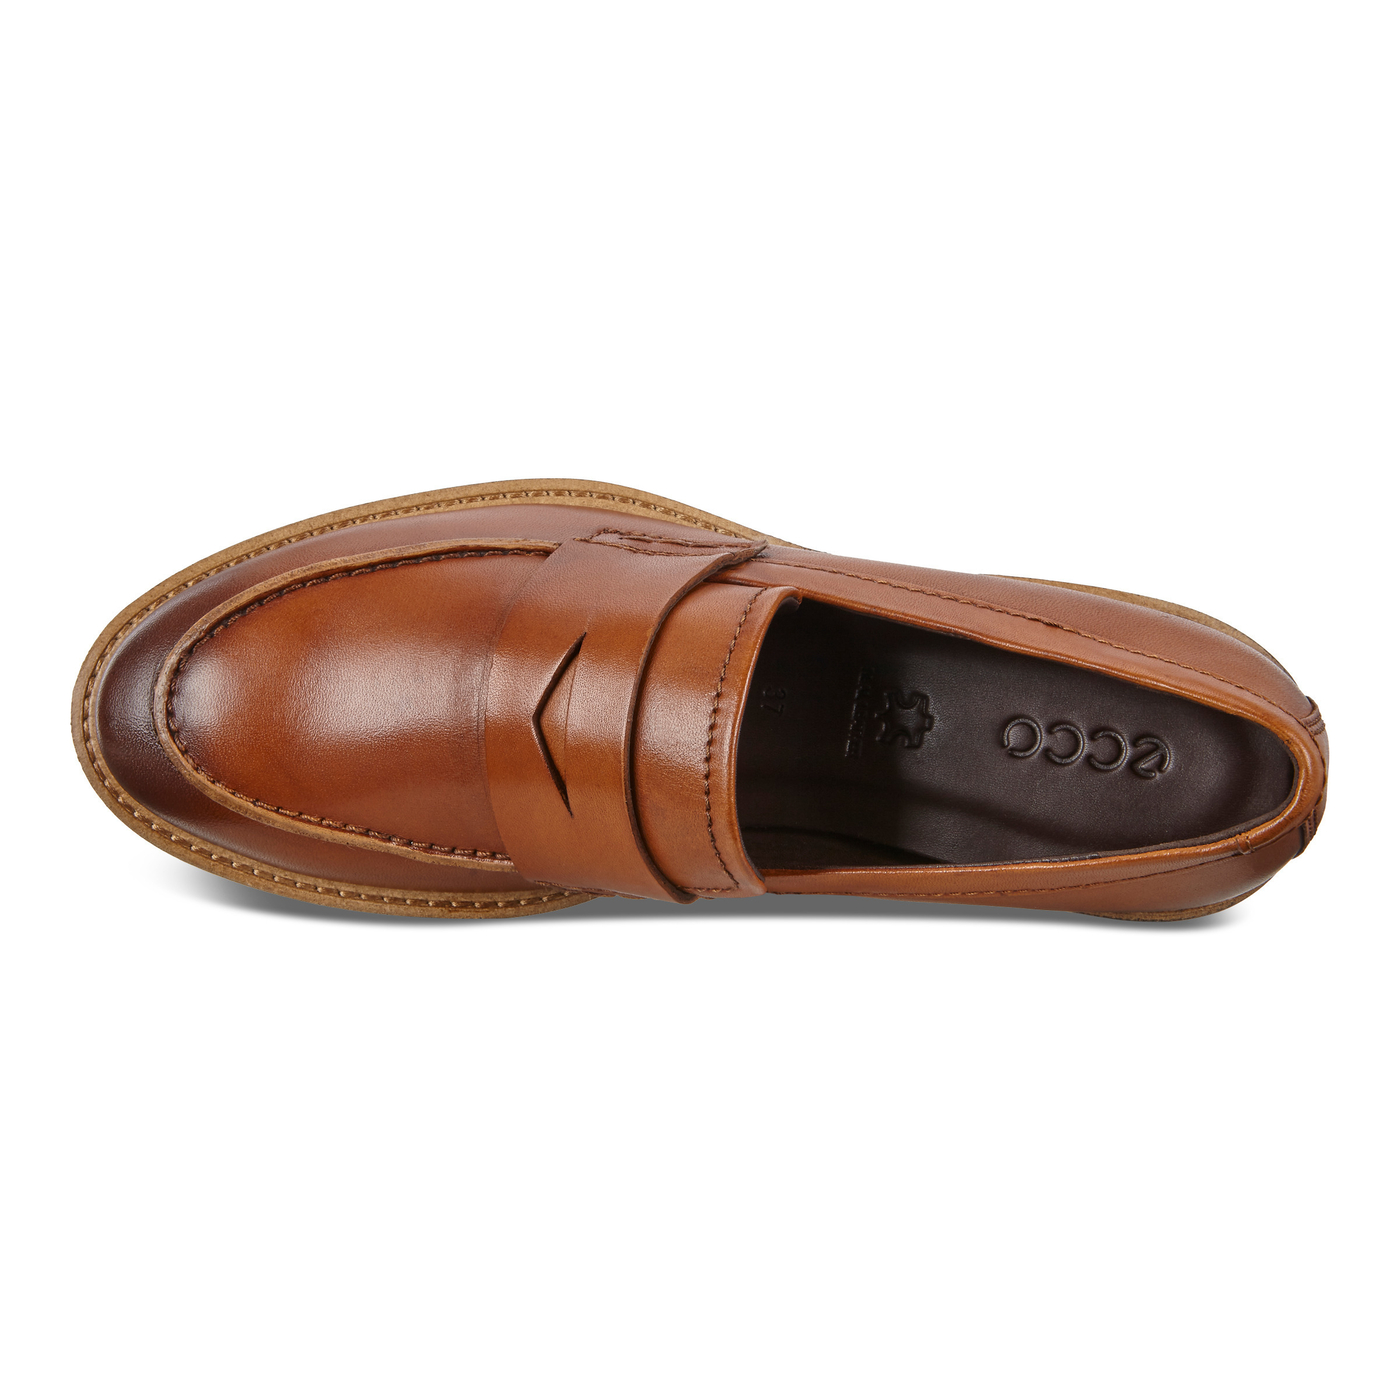 ECCO SARTORELLE TAILORED Manish Loafer 25mm